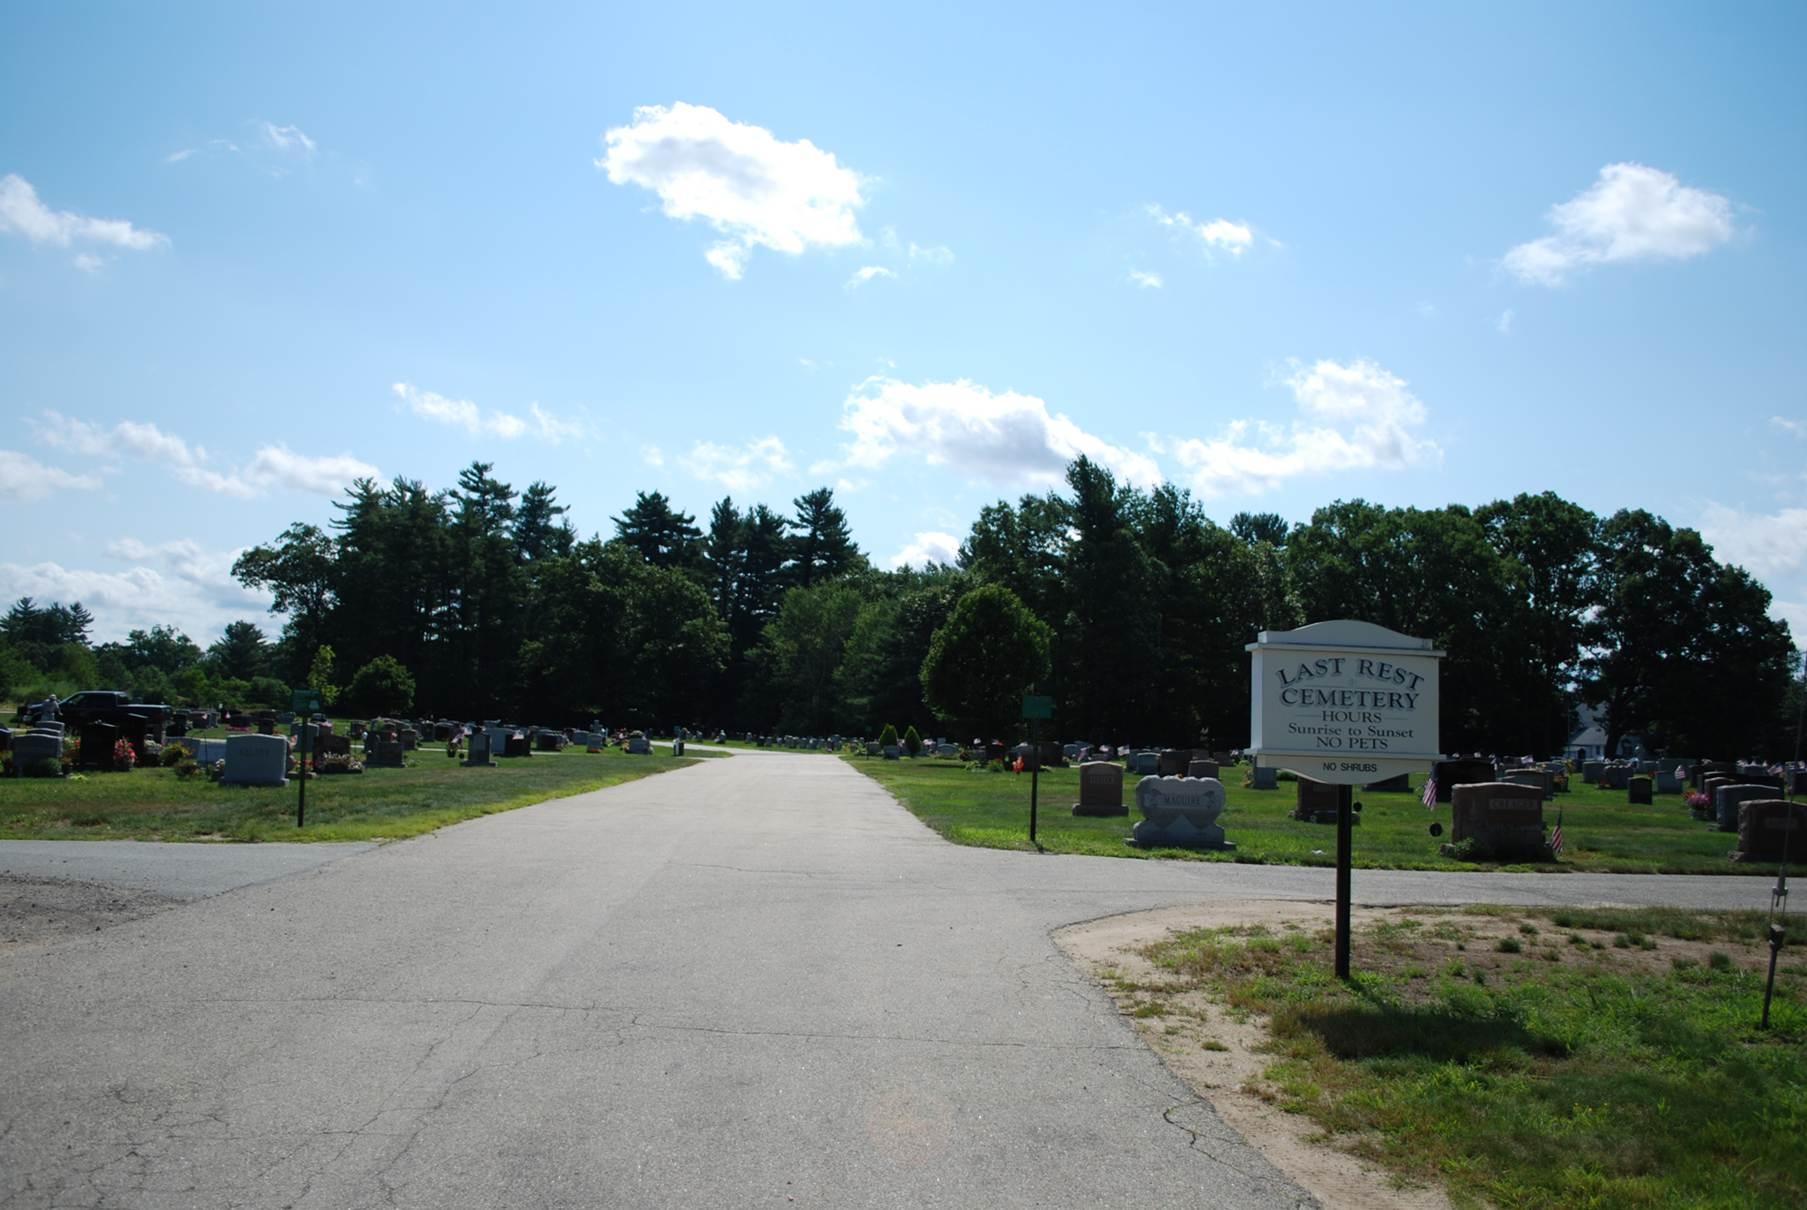 Last Rest Cemetery